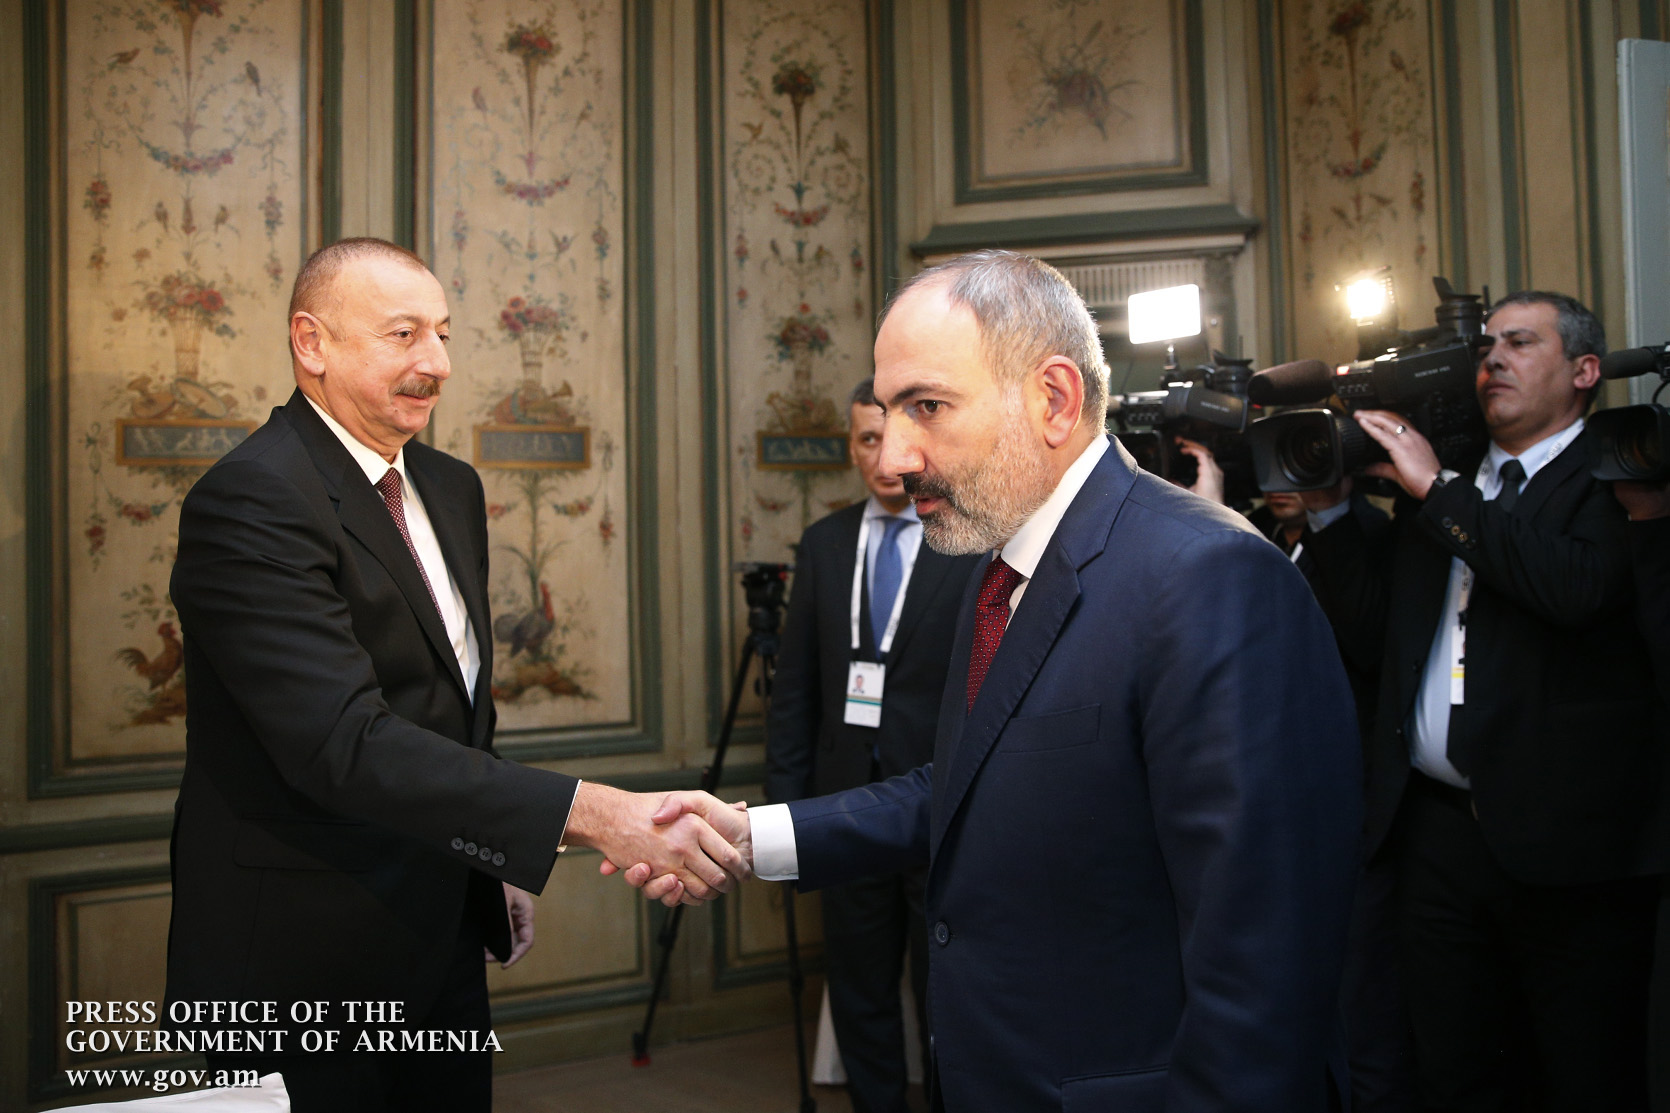 Nikol Pashinyan, news Armenia, Ilham Aliyev, Shurnukh, Syunik, Karabakh, meeting Pashinyan Aliyev,